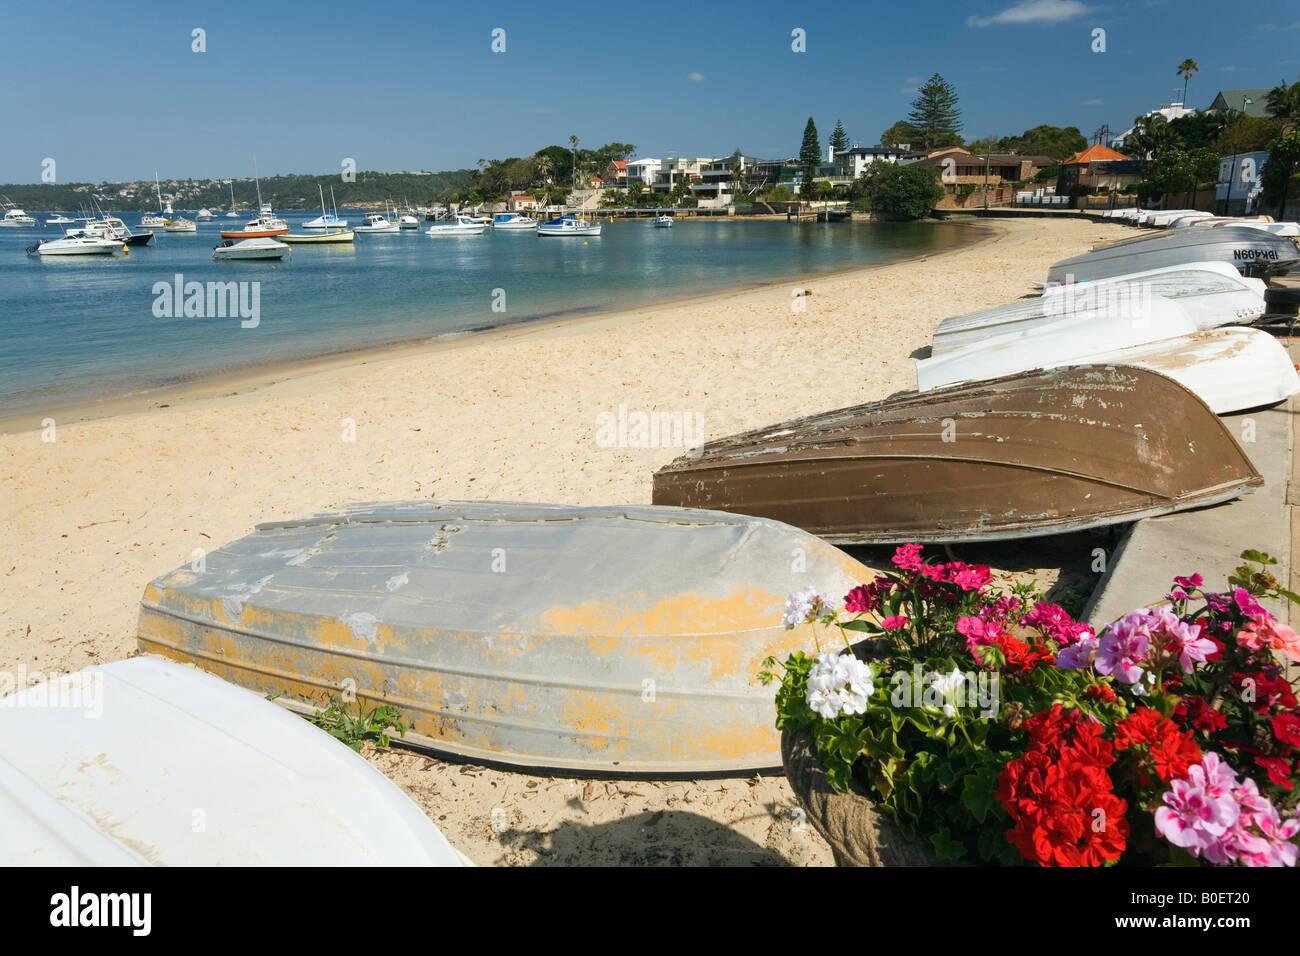 Watson's Bay - Sydney, New South Wales, AUSTRALIA - Stock Image